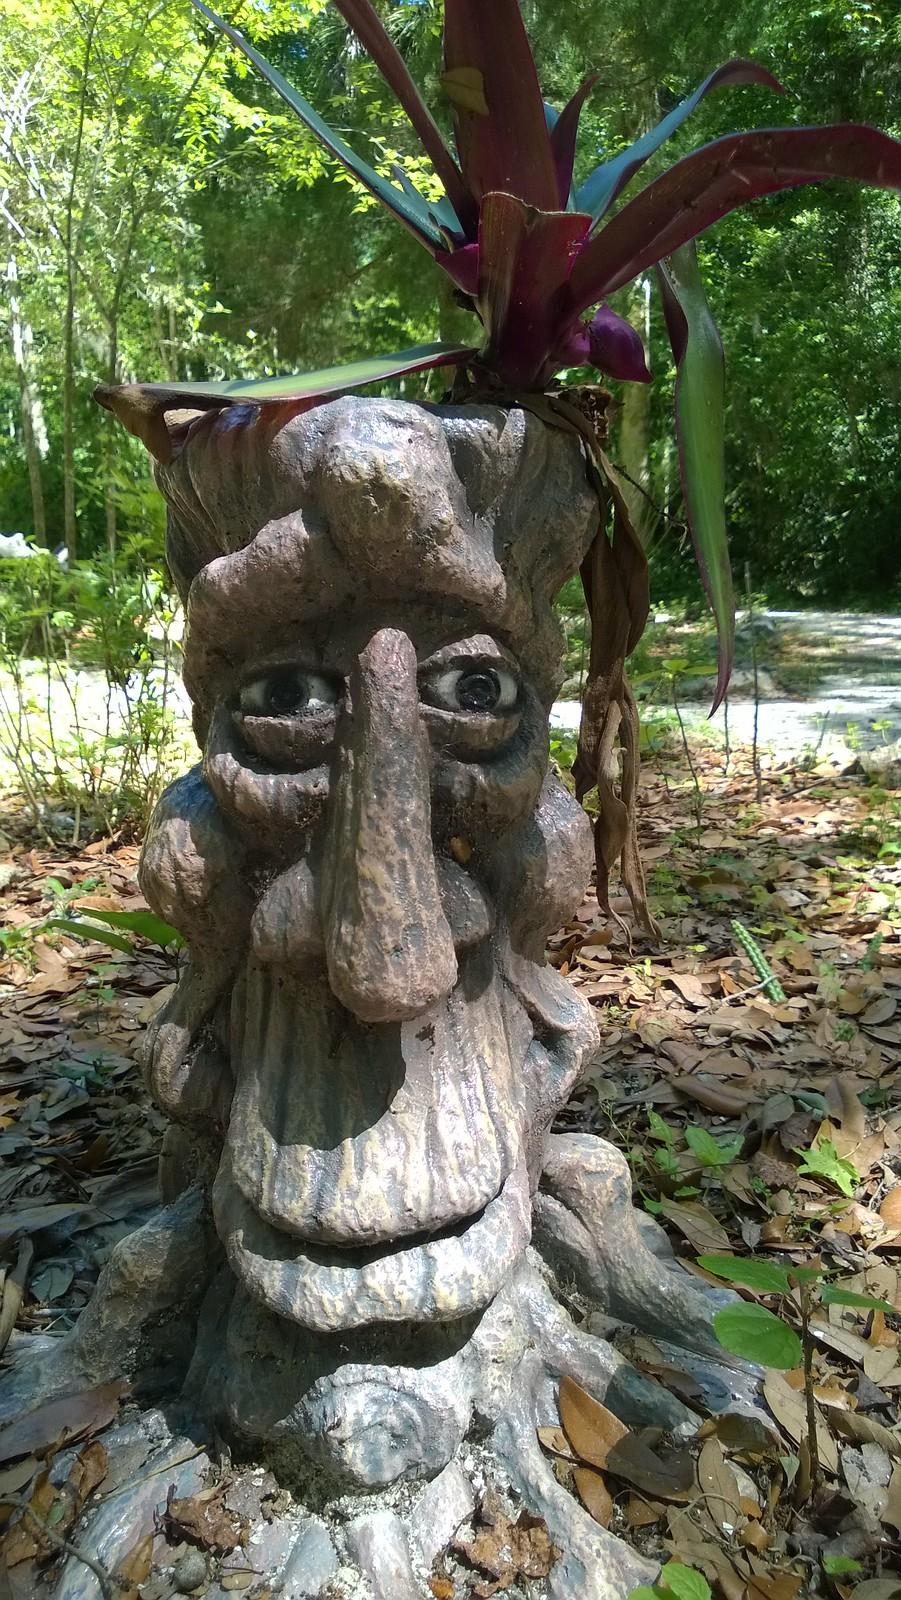 Bongoland - Happy tree fellow?!